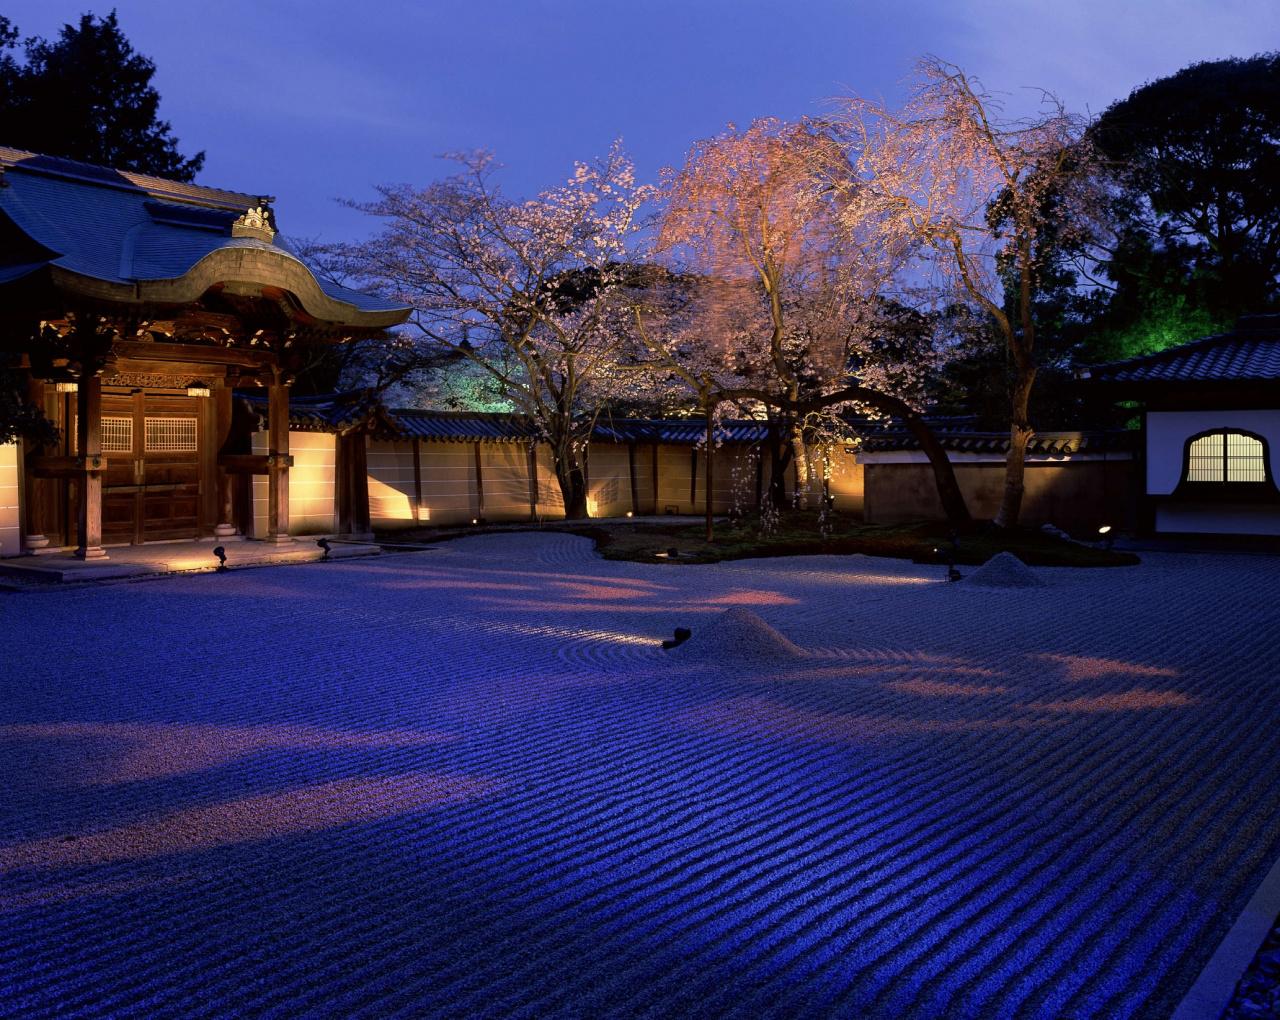 Katsuhiko Mizuno, Spring at Kodaiji Temple, 2006